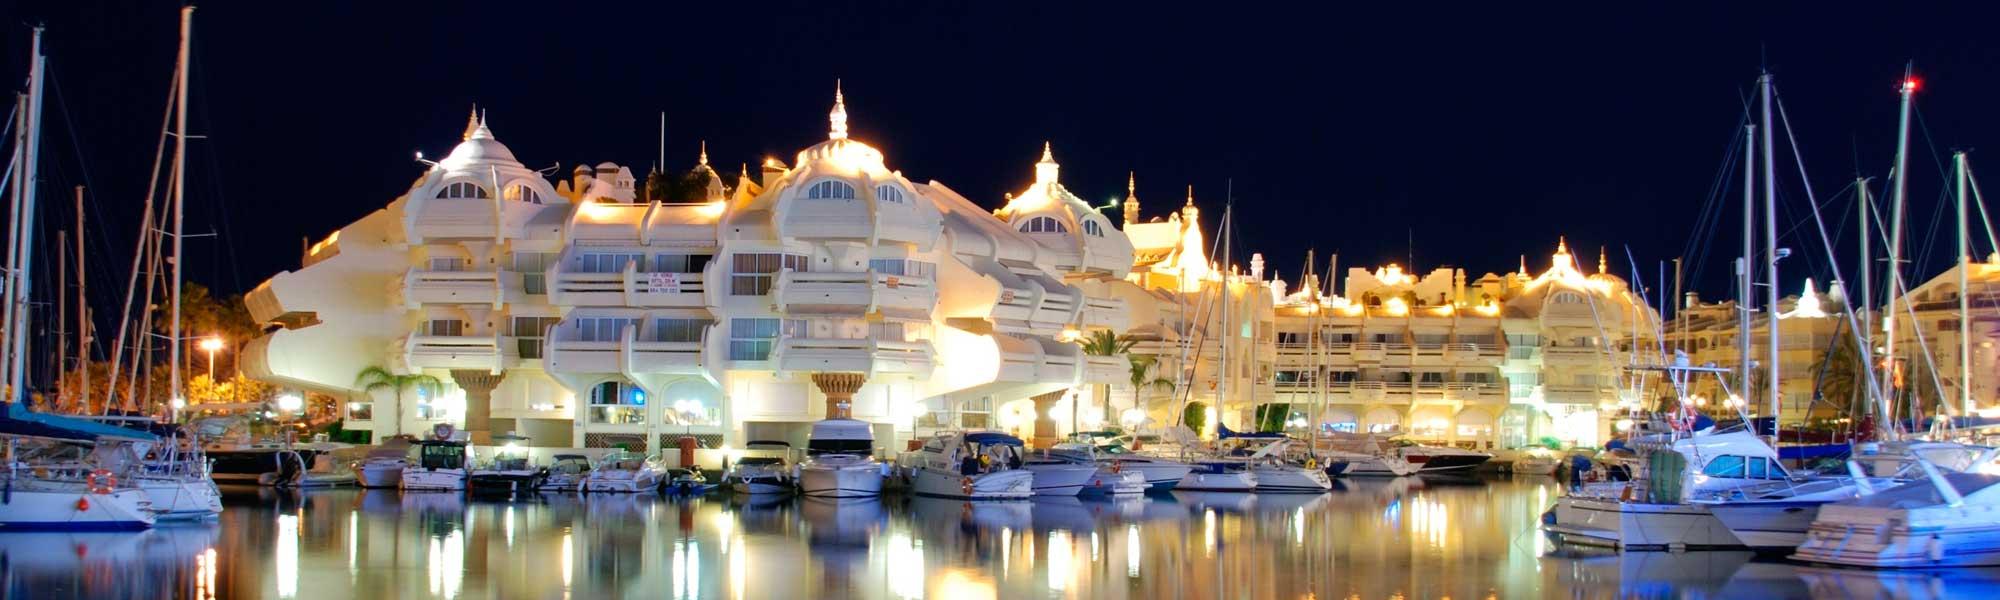 Benalmadena Hotels